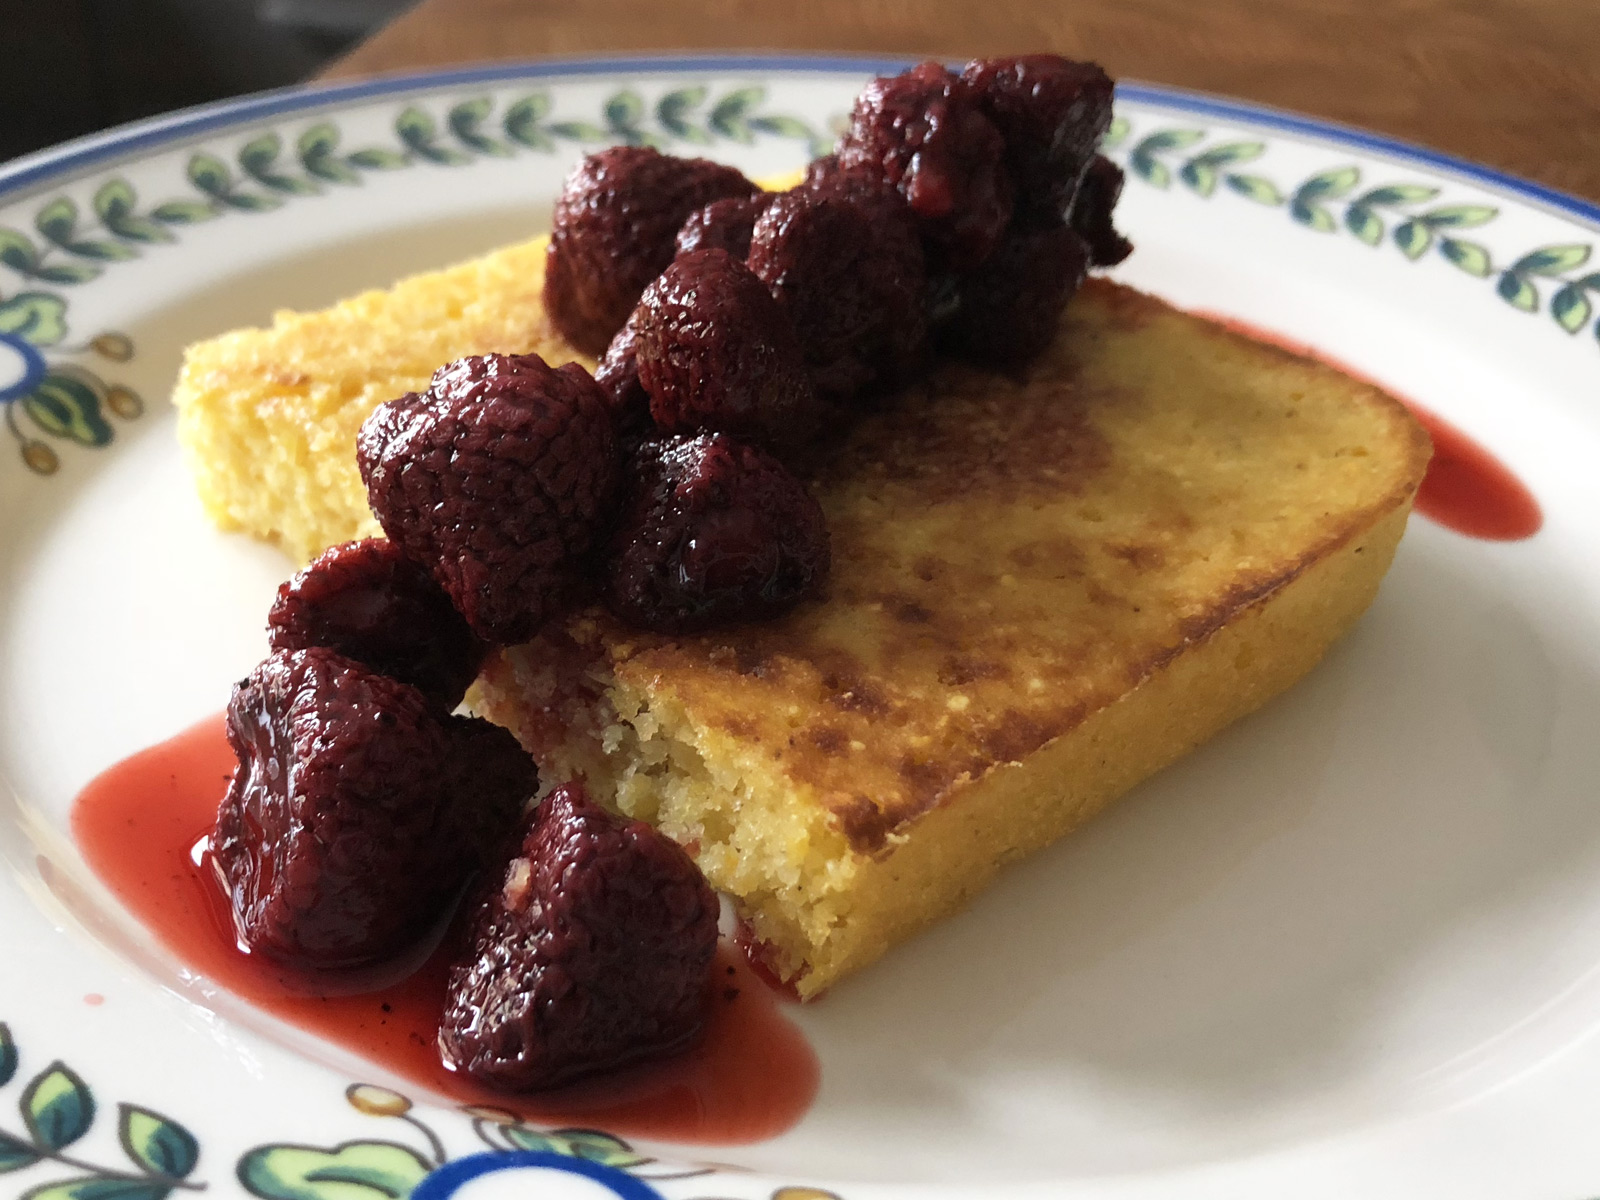 corn-bake-berries.jpg